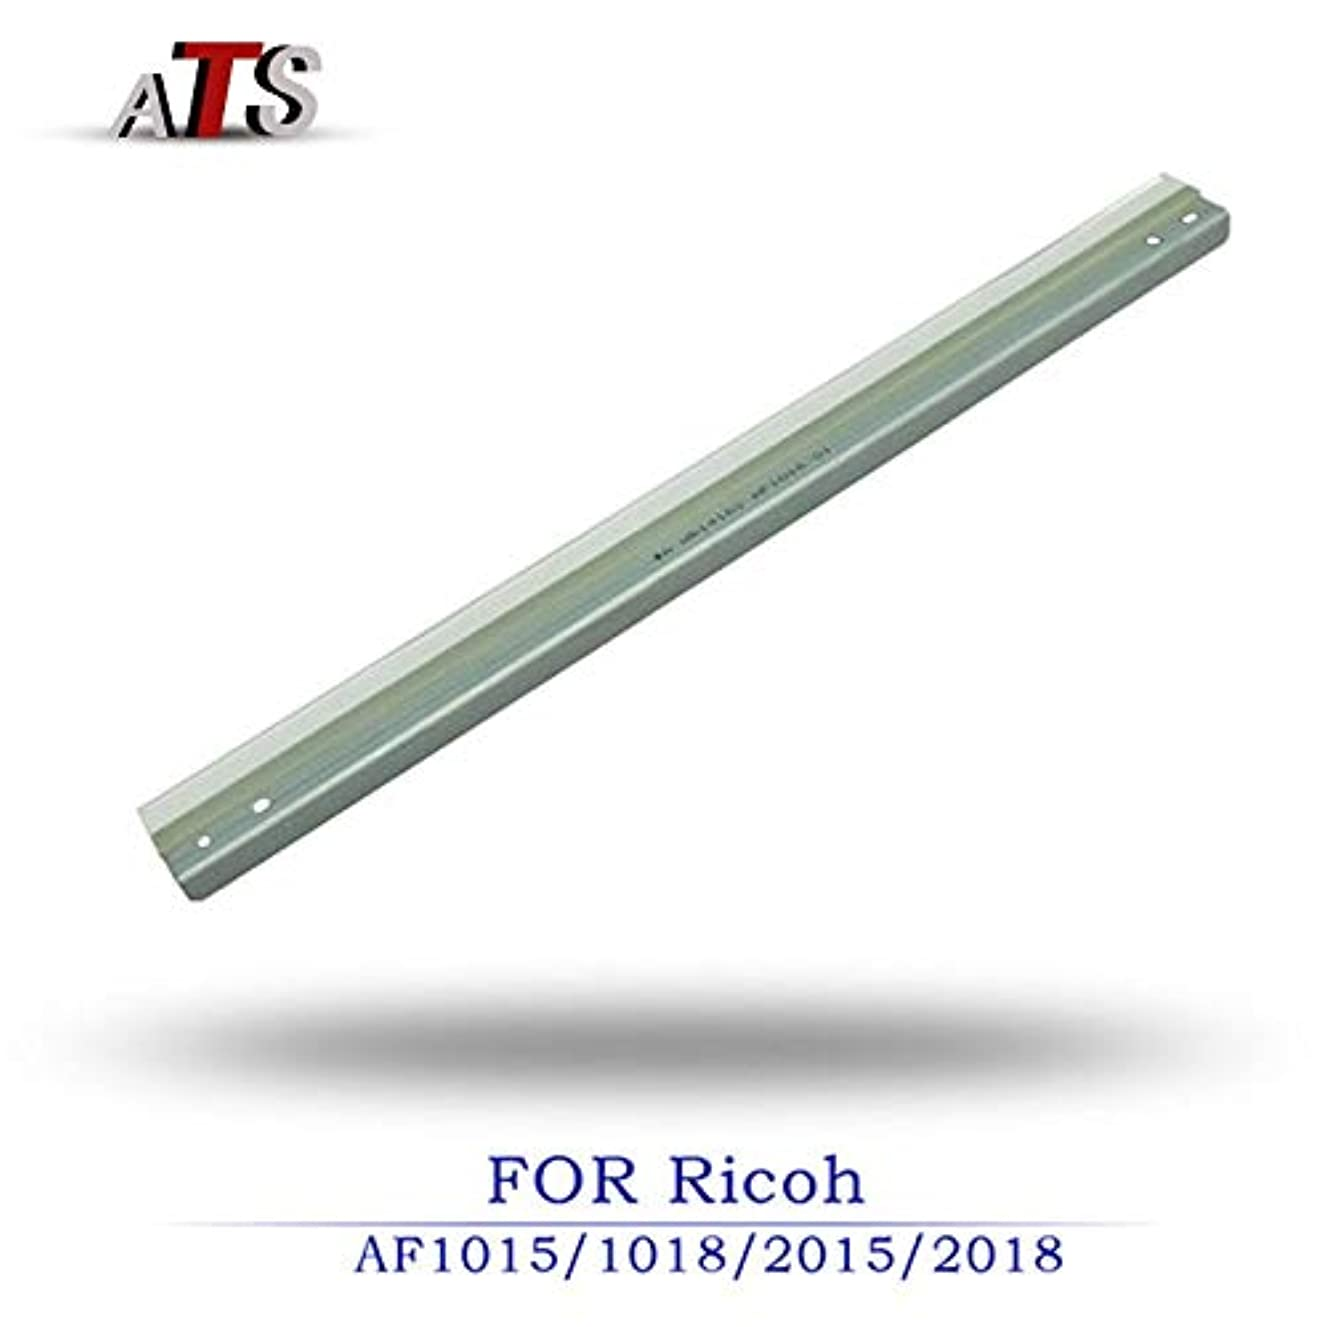 Printer Parts 2pcs/lot Drum Cleaning Blade Compatible Copier Spare Parts for Yoton AFICIO AF 1015 1018 220 270 1022 2015 2018 2022 2027 2032